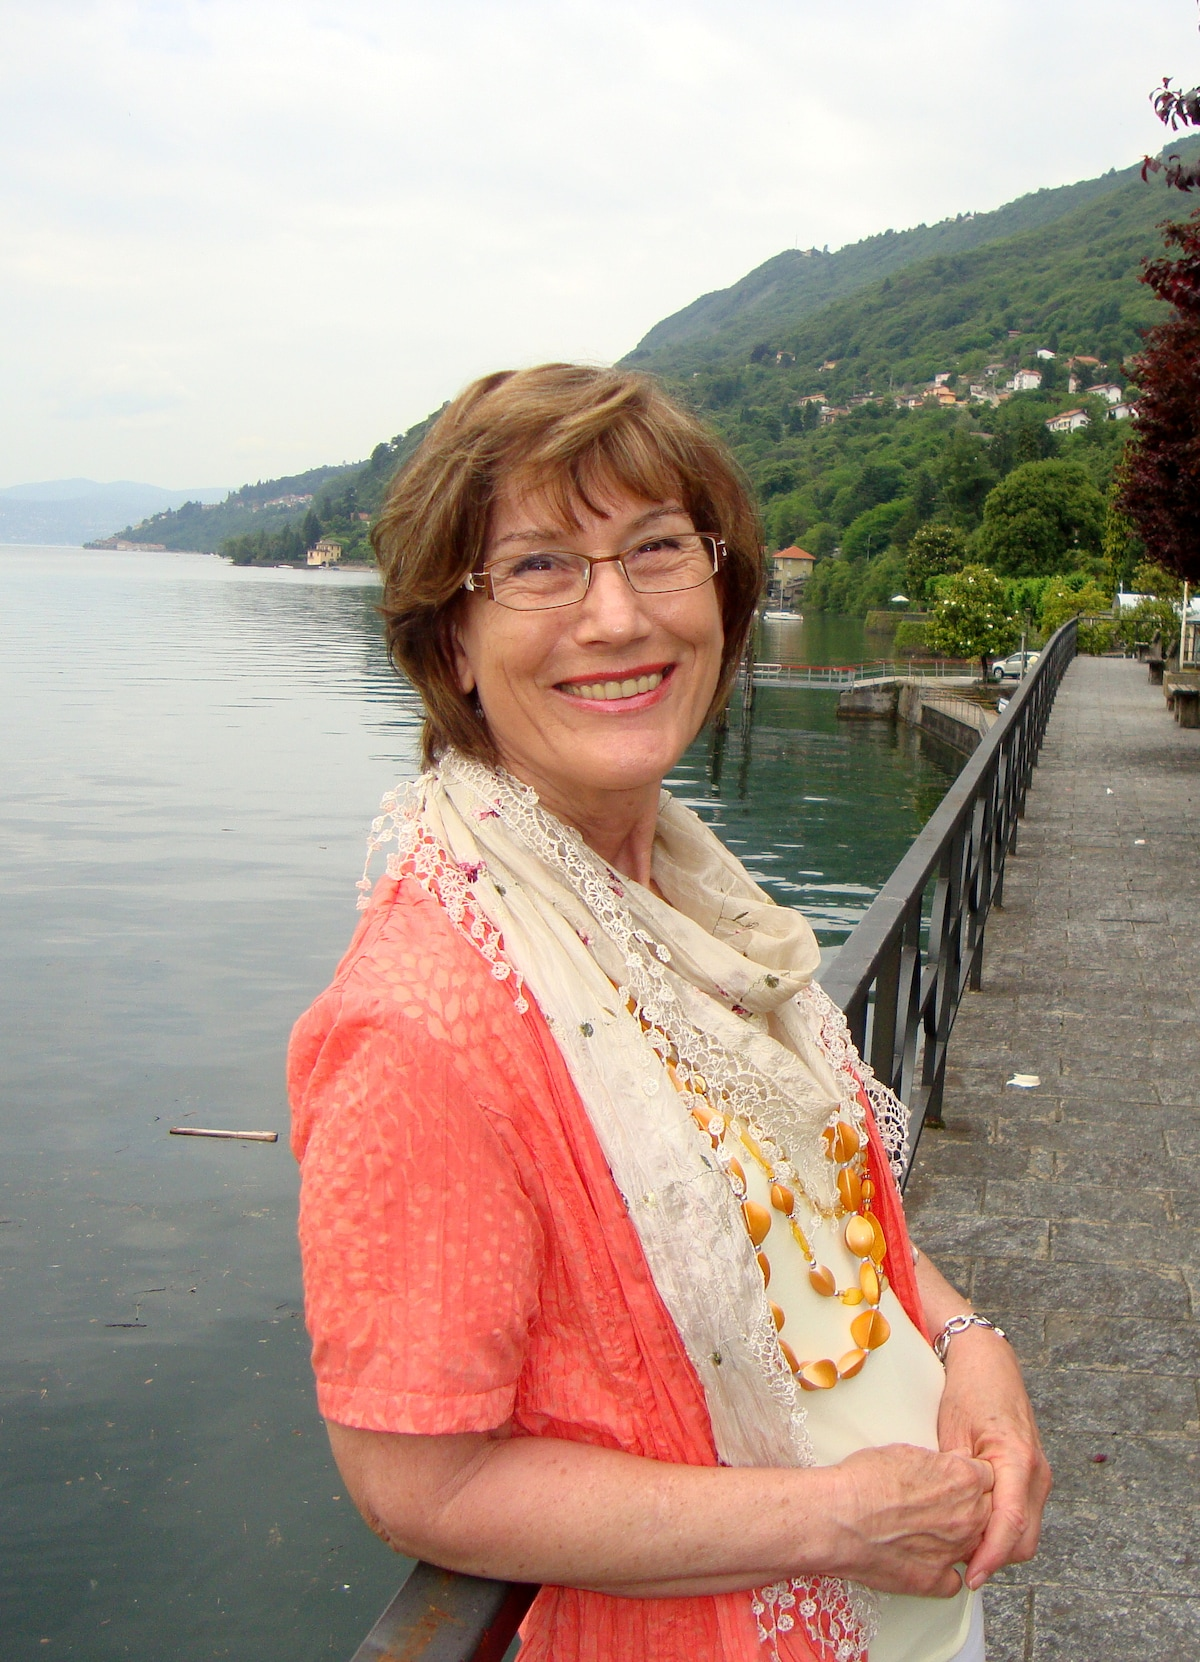 Rosemarie da Geislingen